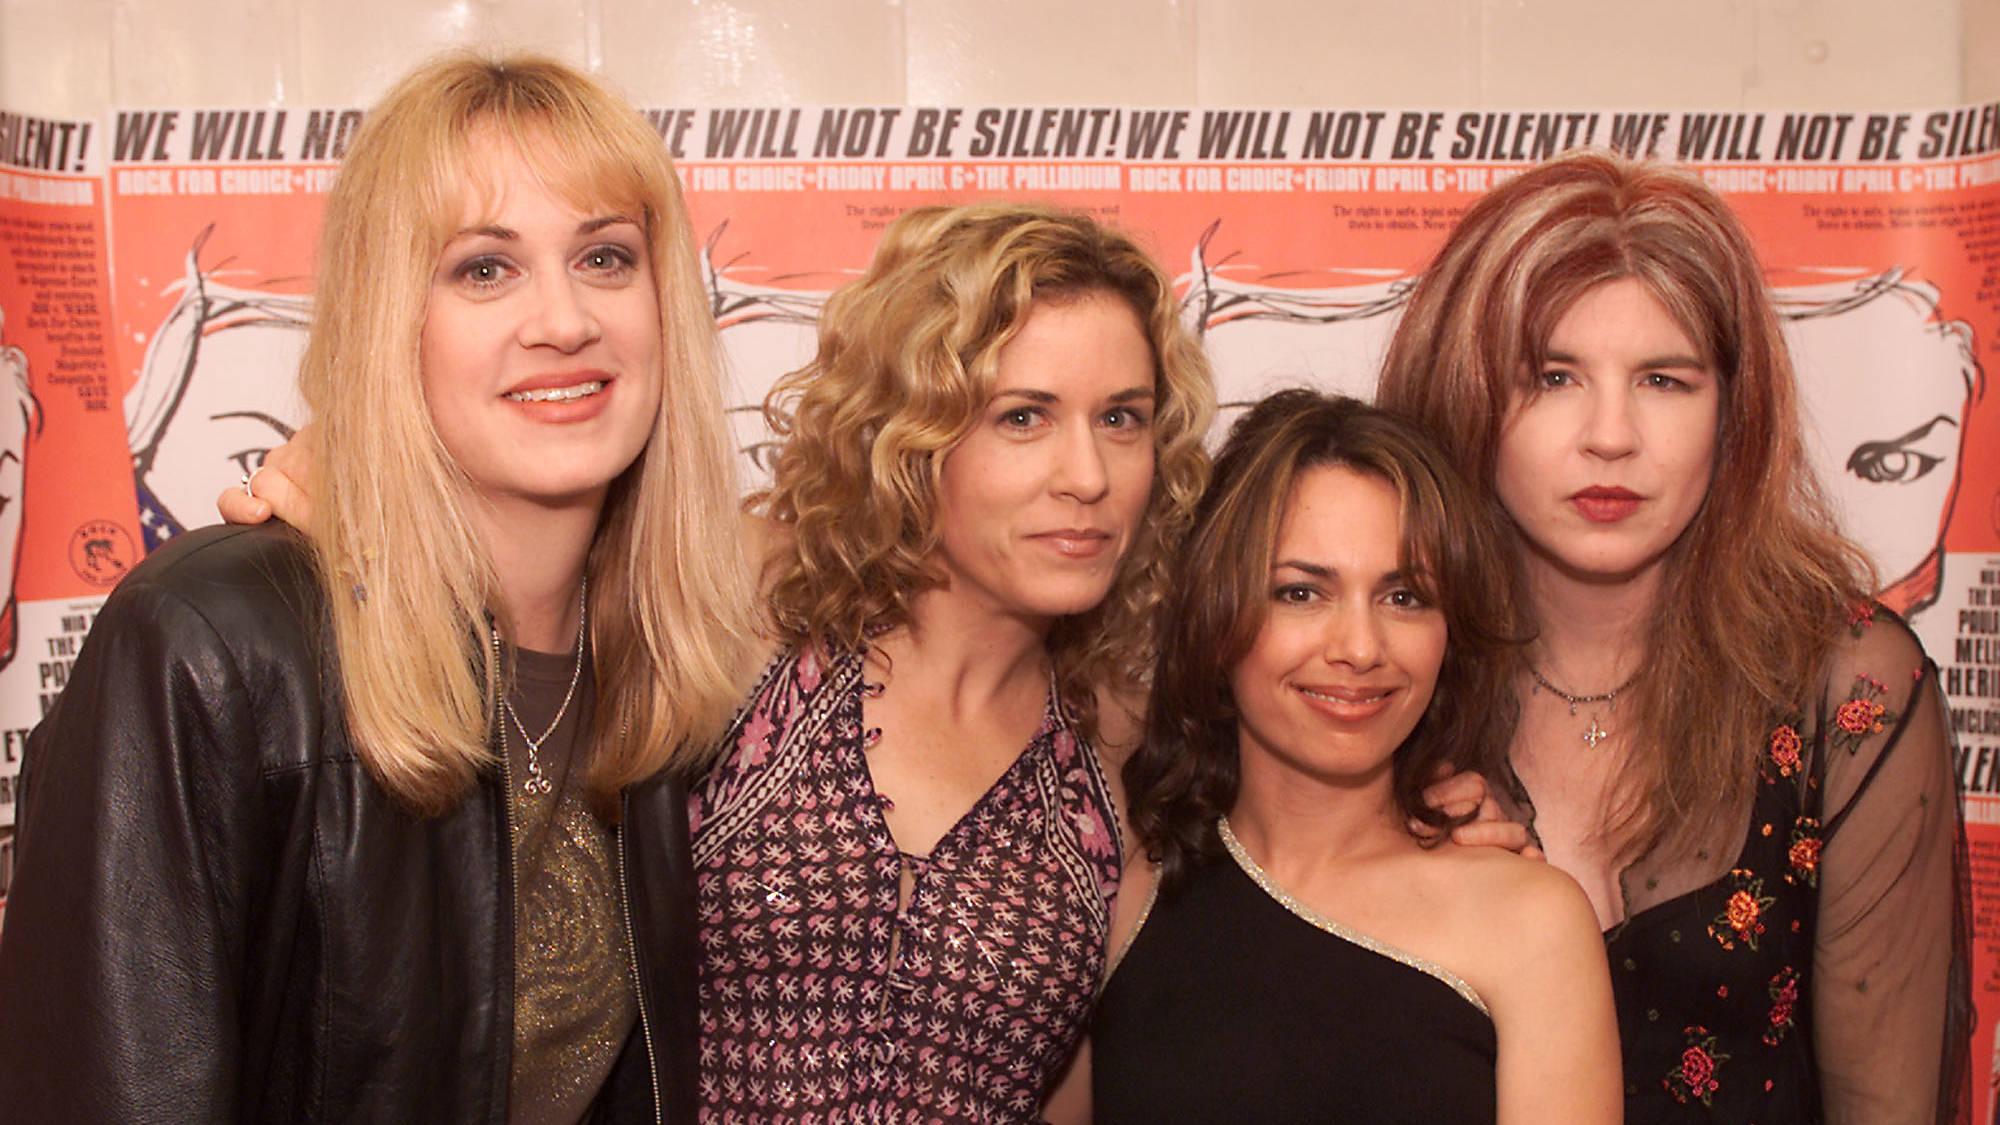 Susanna Hoffs, Debbi Peterson, Vicki Peterson and Annette Zilinskas of The Bangles now